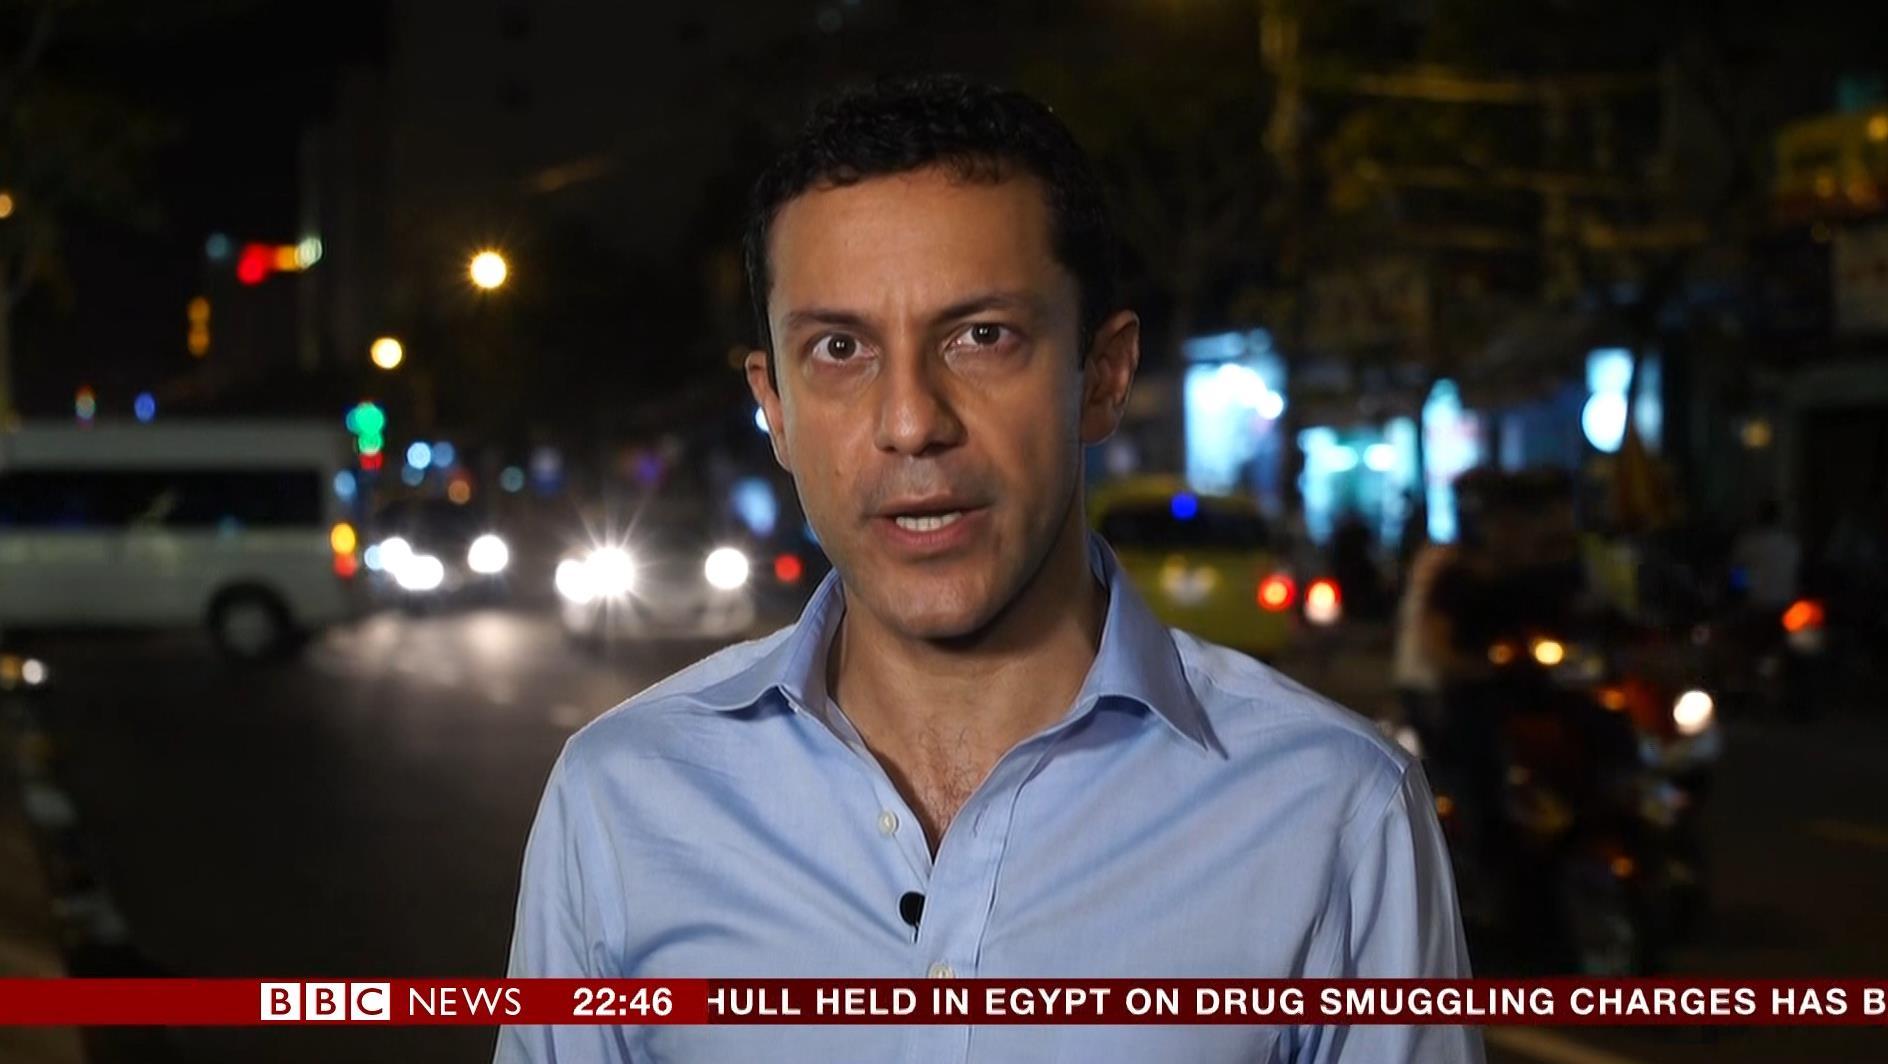 Aleem Maqbool - BBC News Correspondent (2)